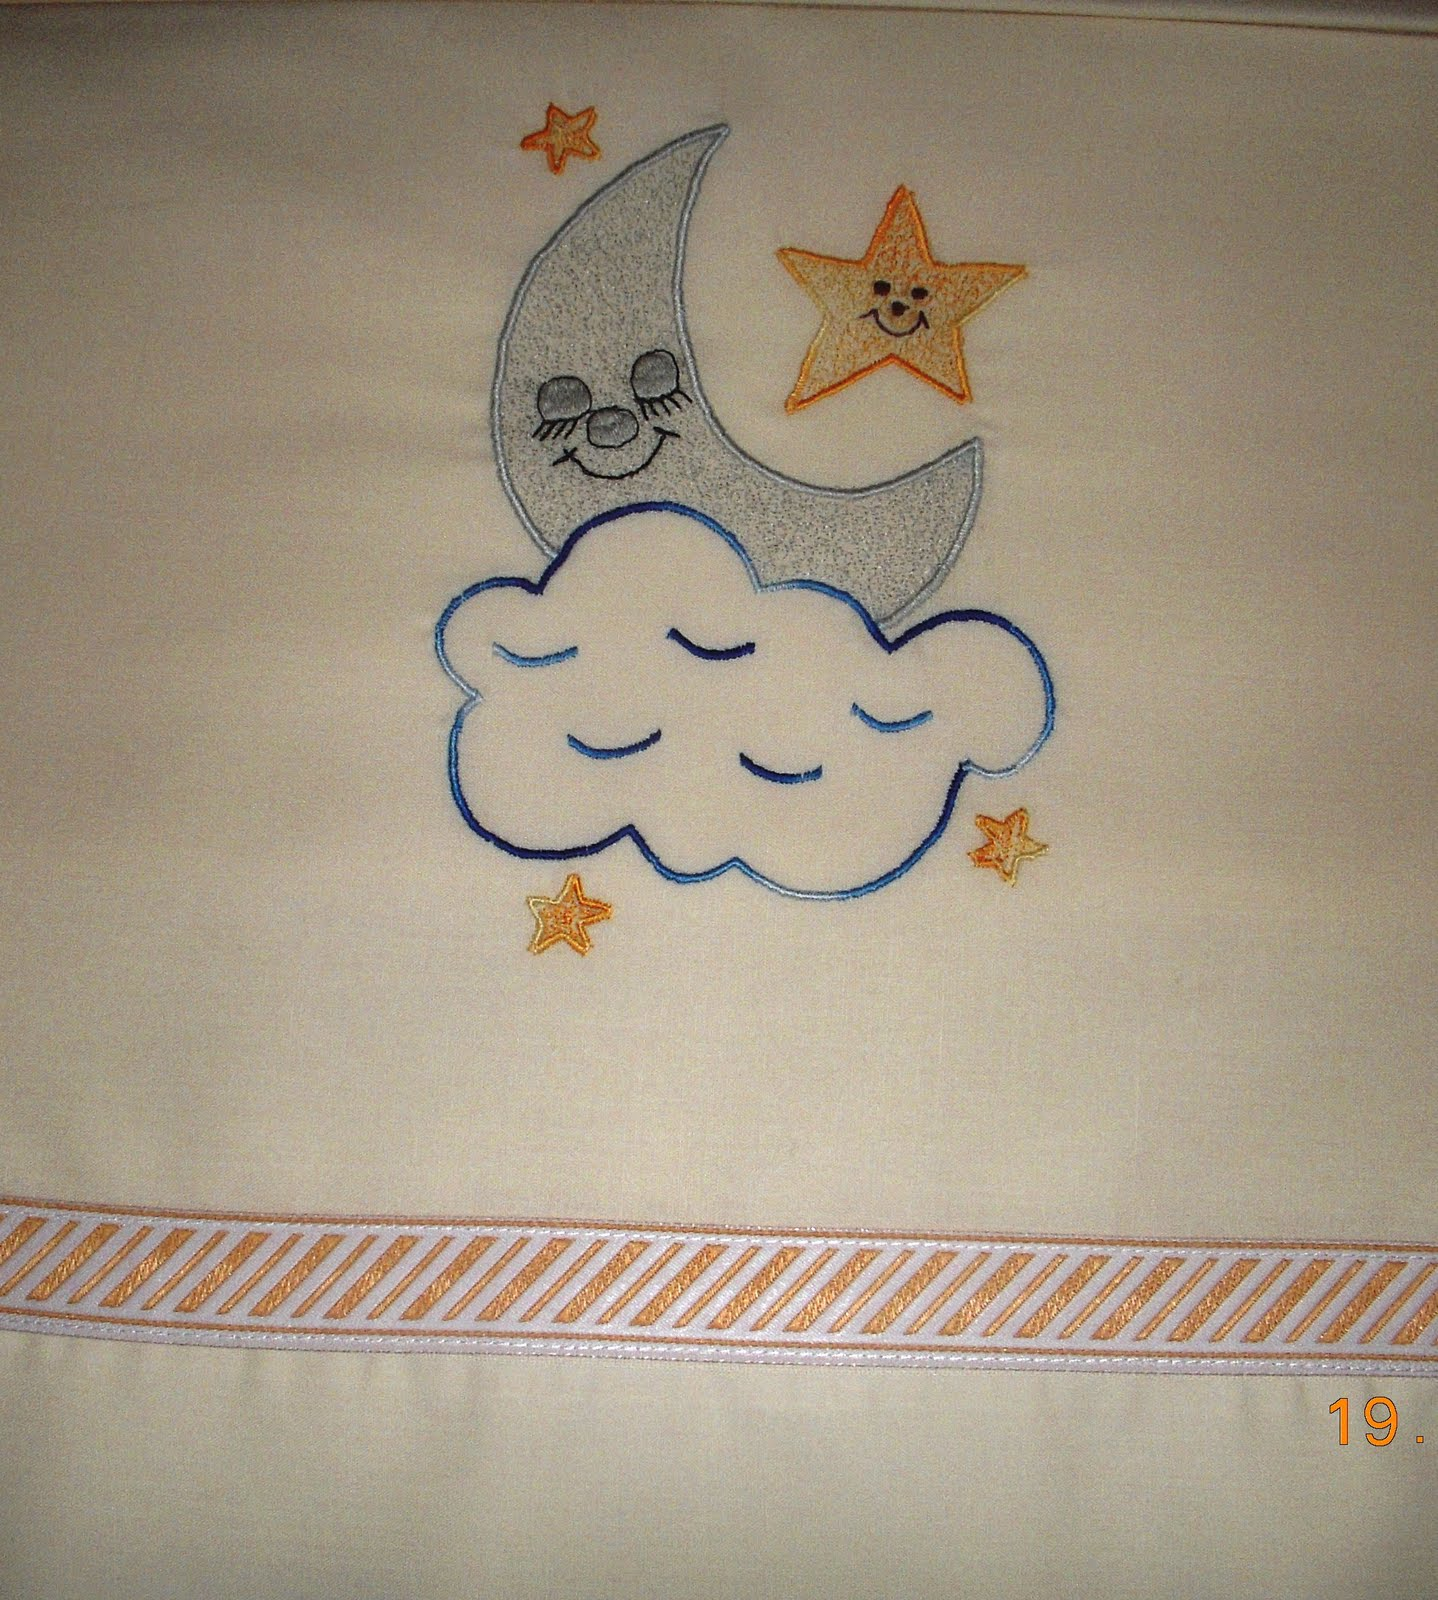 Mis trabajos nieves moreno bordados en sabanas infantiles - Dibujos para pintar en tela infantiles ...